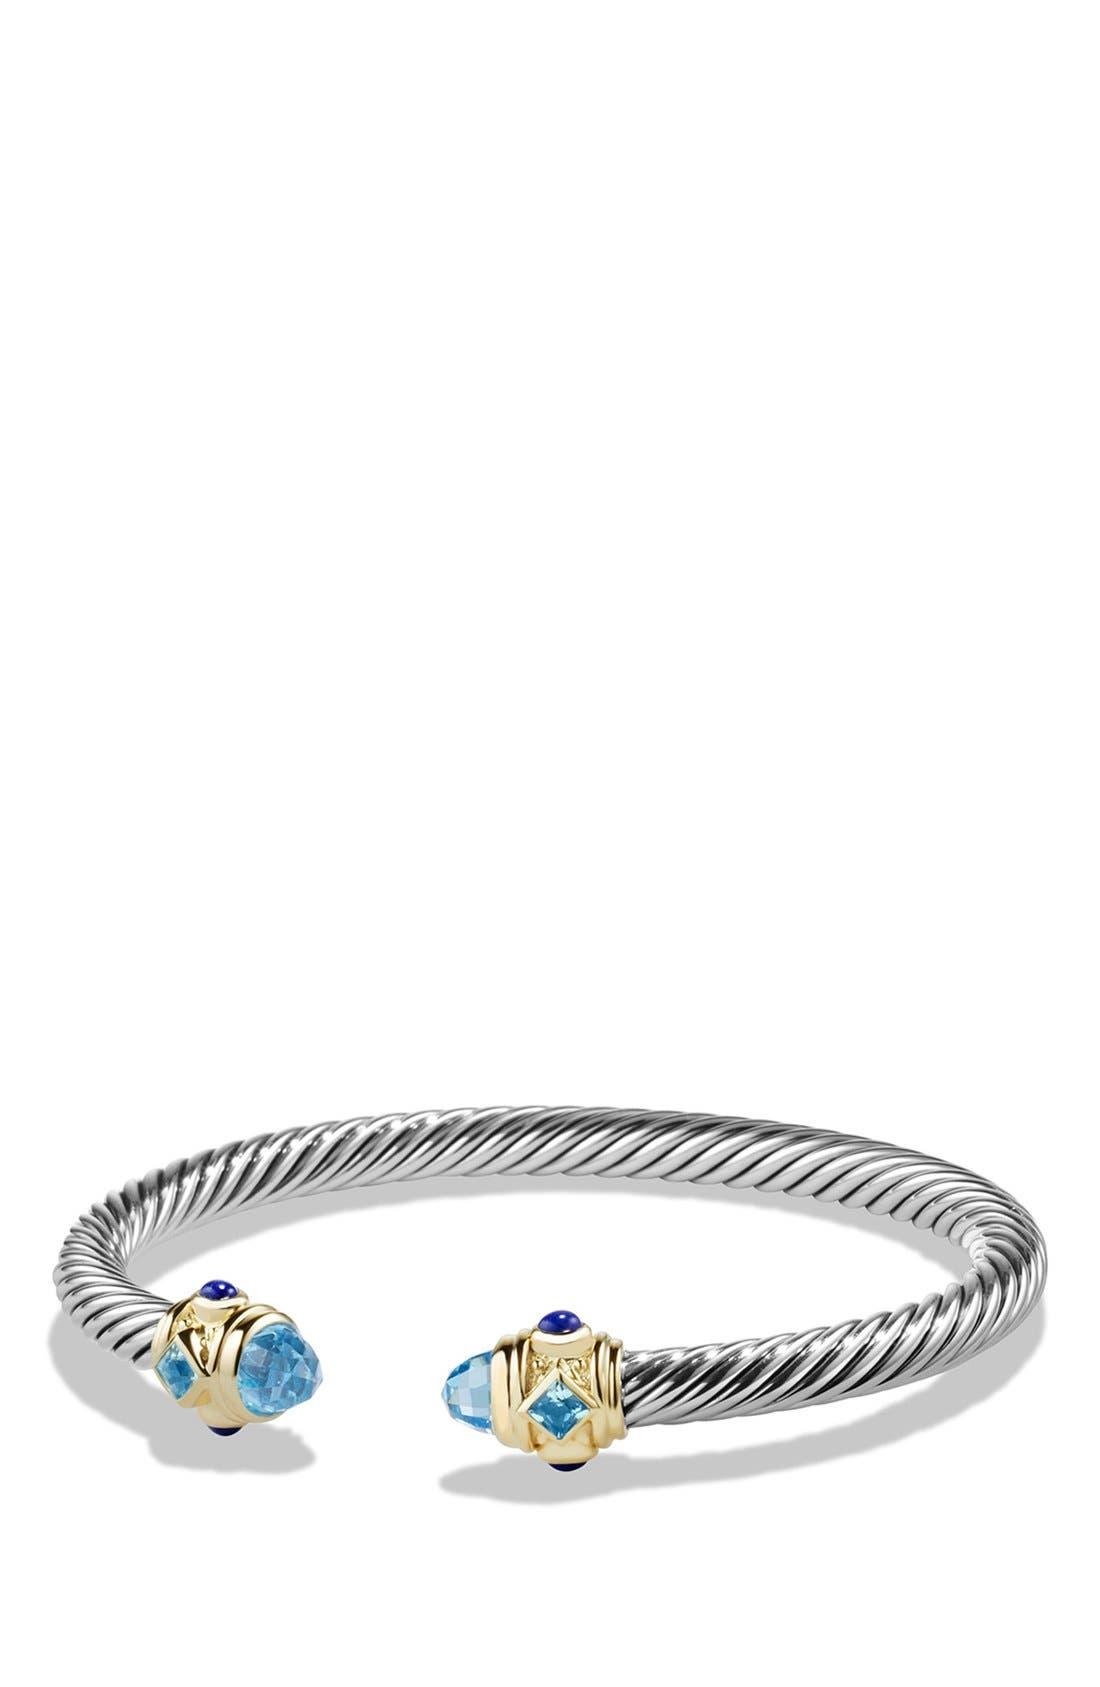 DAVID YURMAN Renaissance Bracelet with Semiprecious Stone and 14k Gold